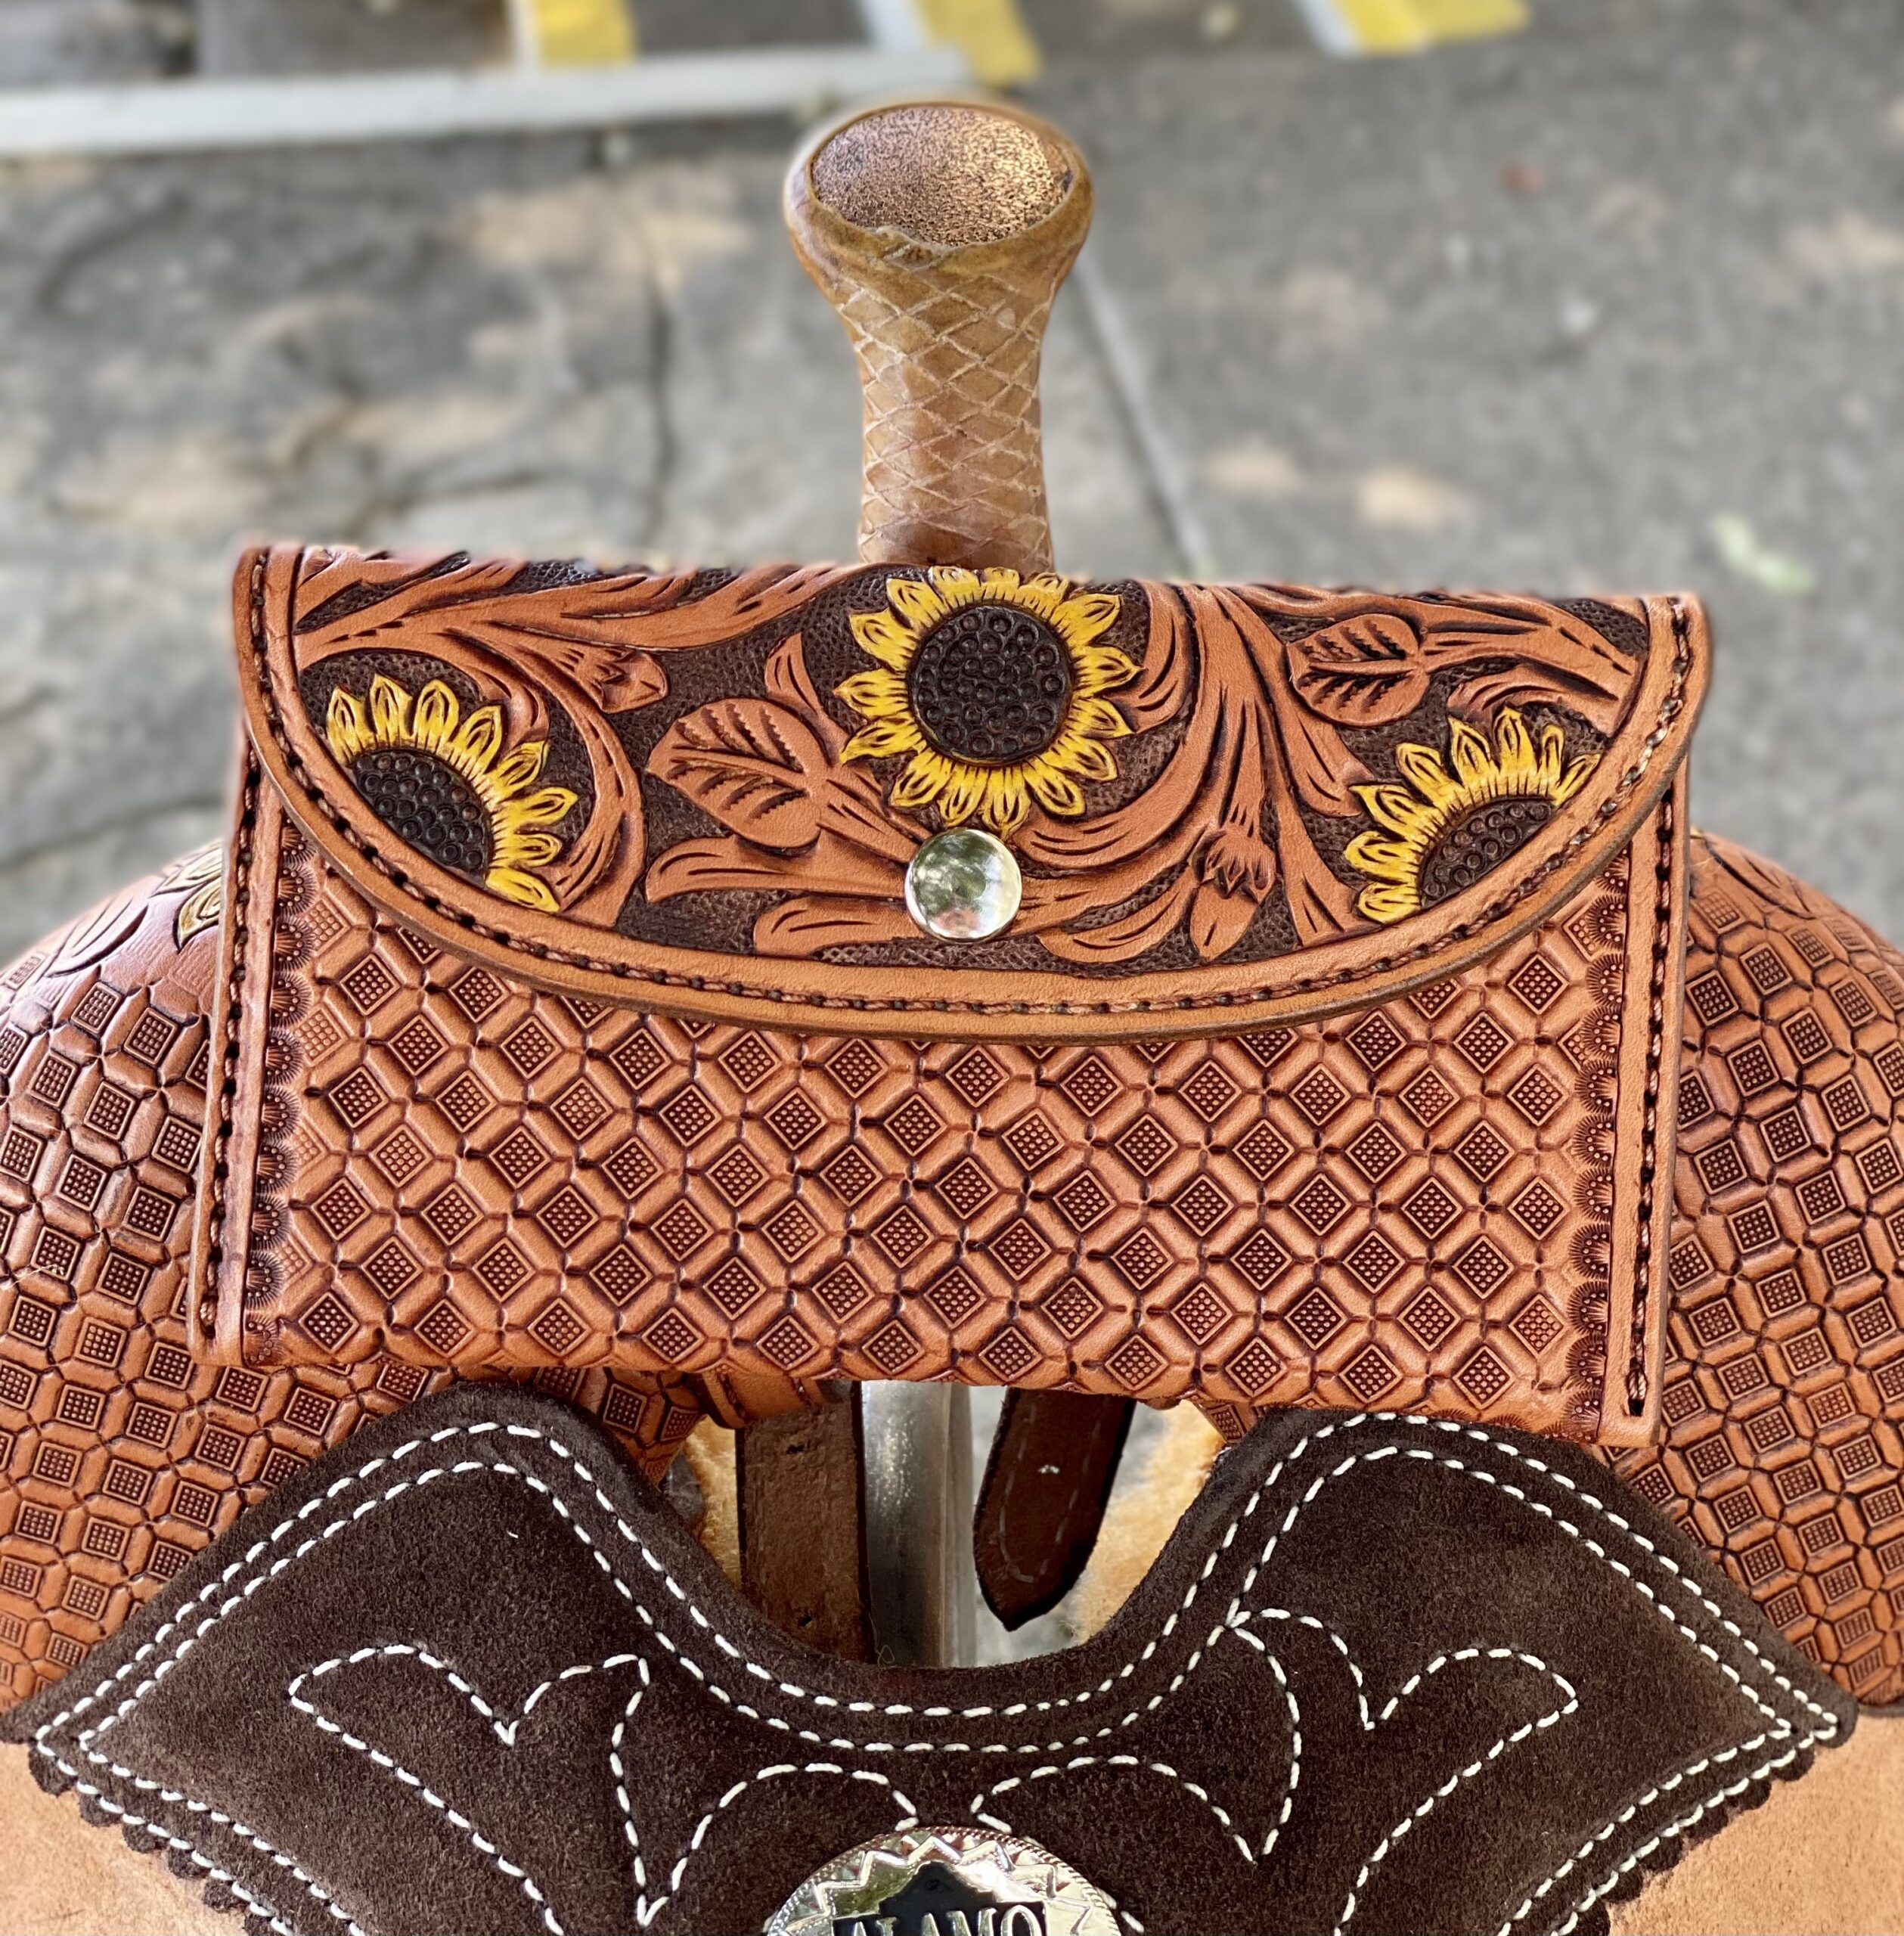 <p><b>PRE-ORDER ONLY</b></p>Pleasure Sunflower saddle